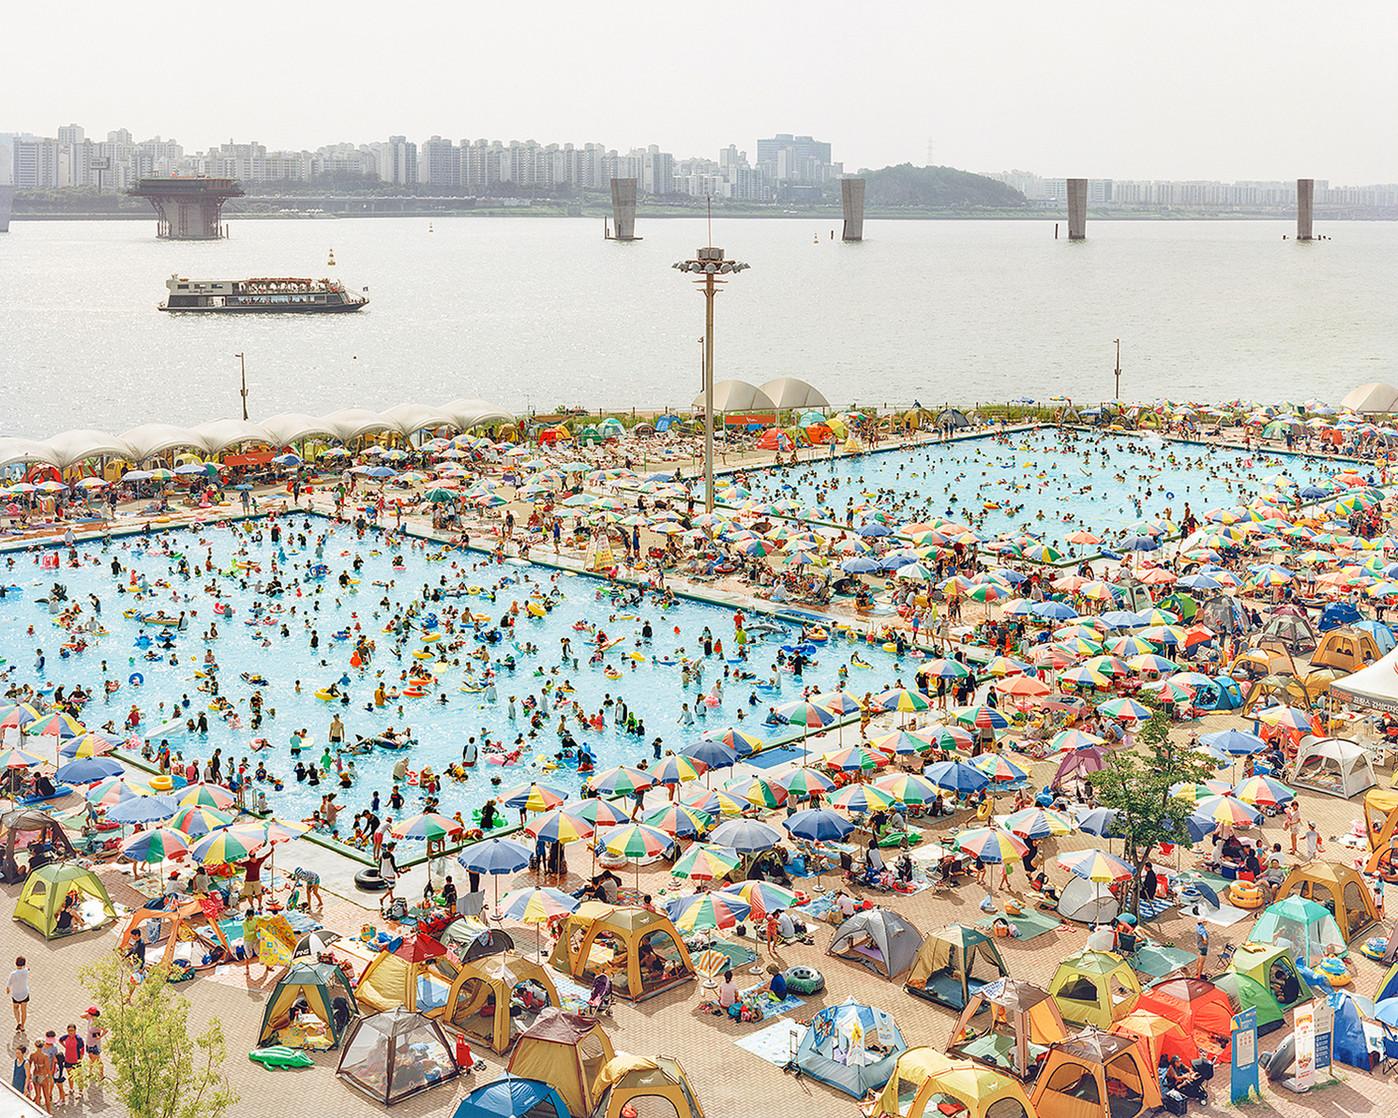 Swimming Pool, Seoul, August 2016